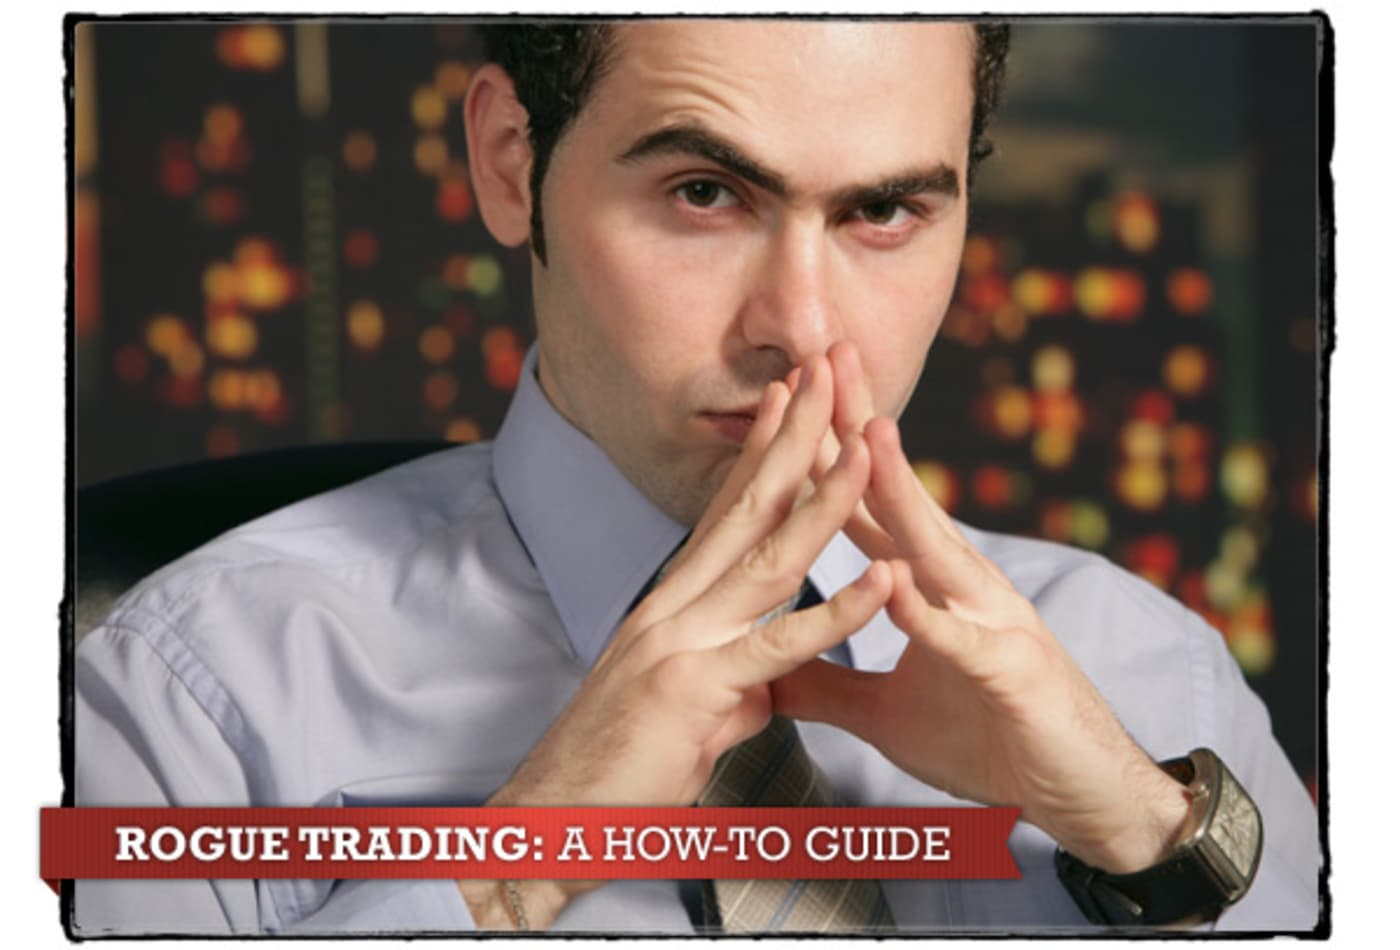 CNBC_rogue_trading_Cover_v2.jpg